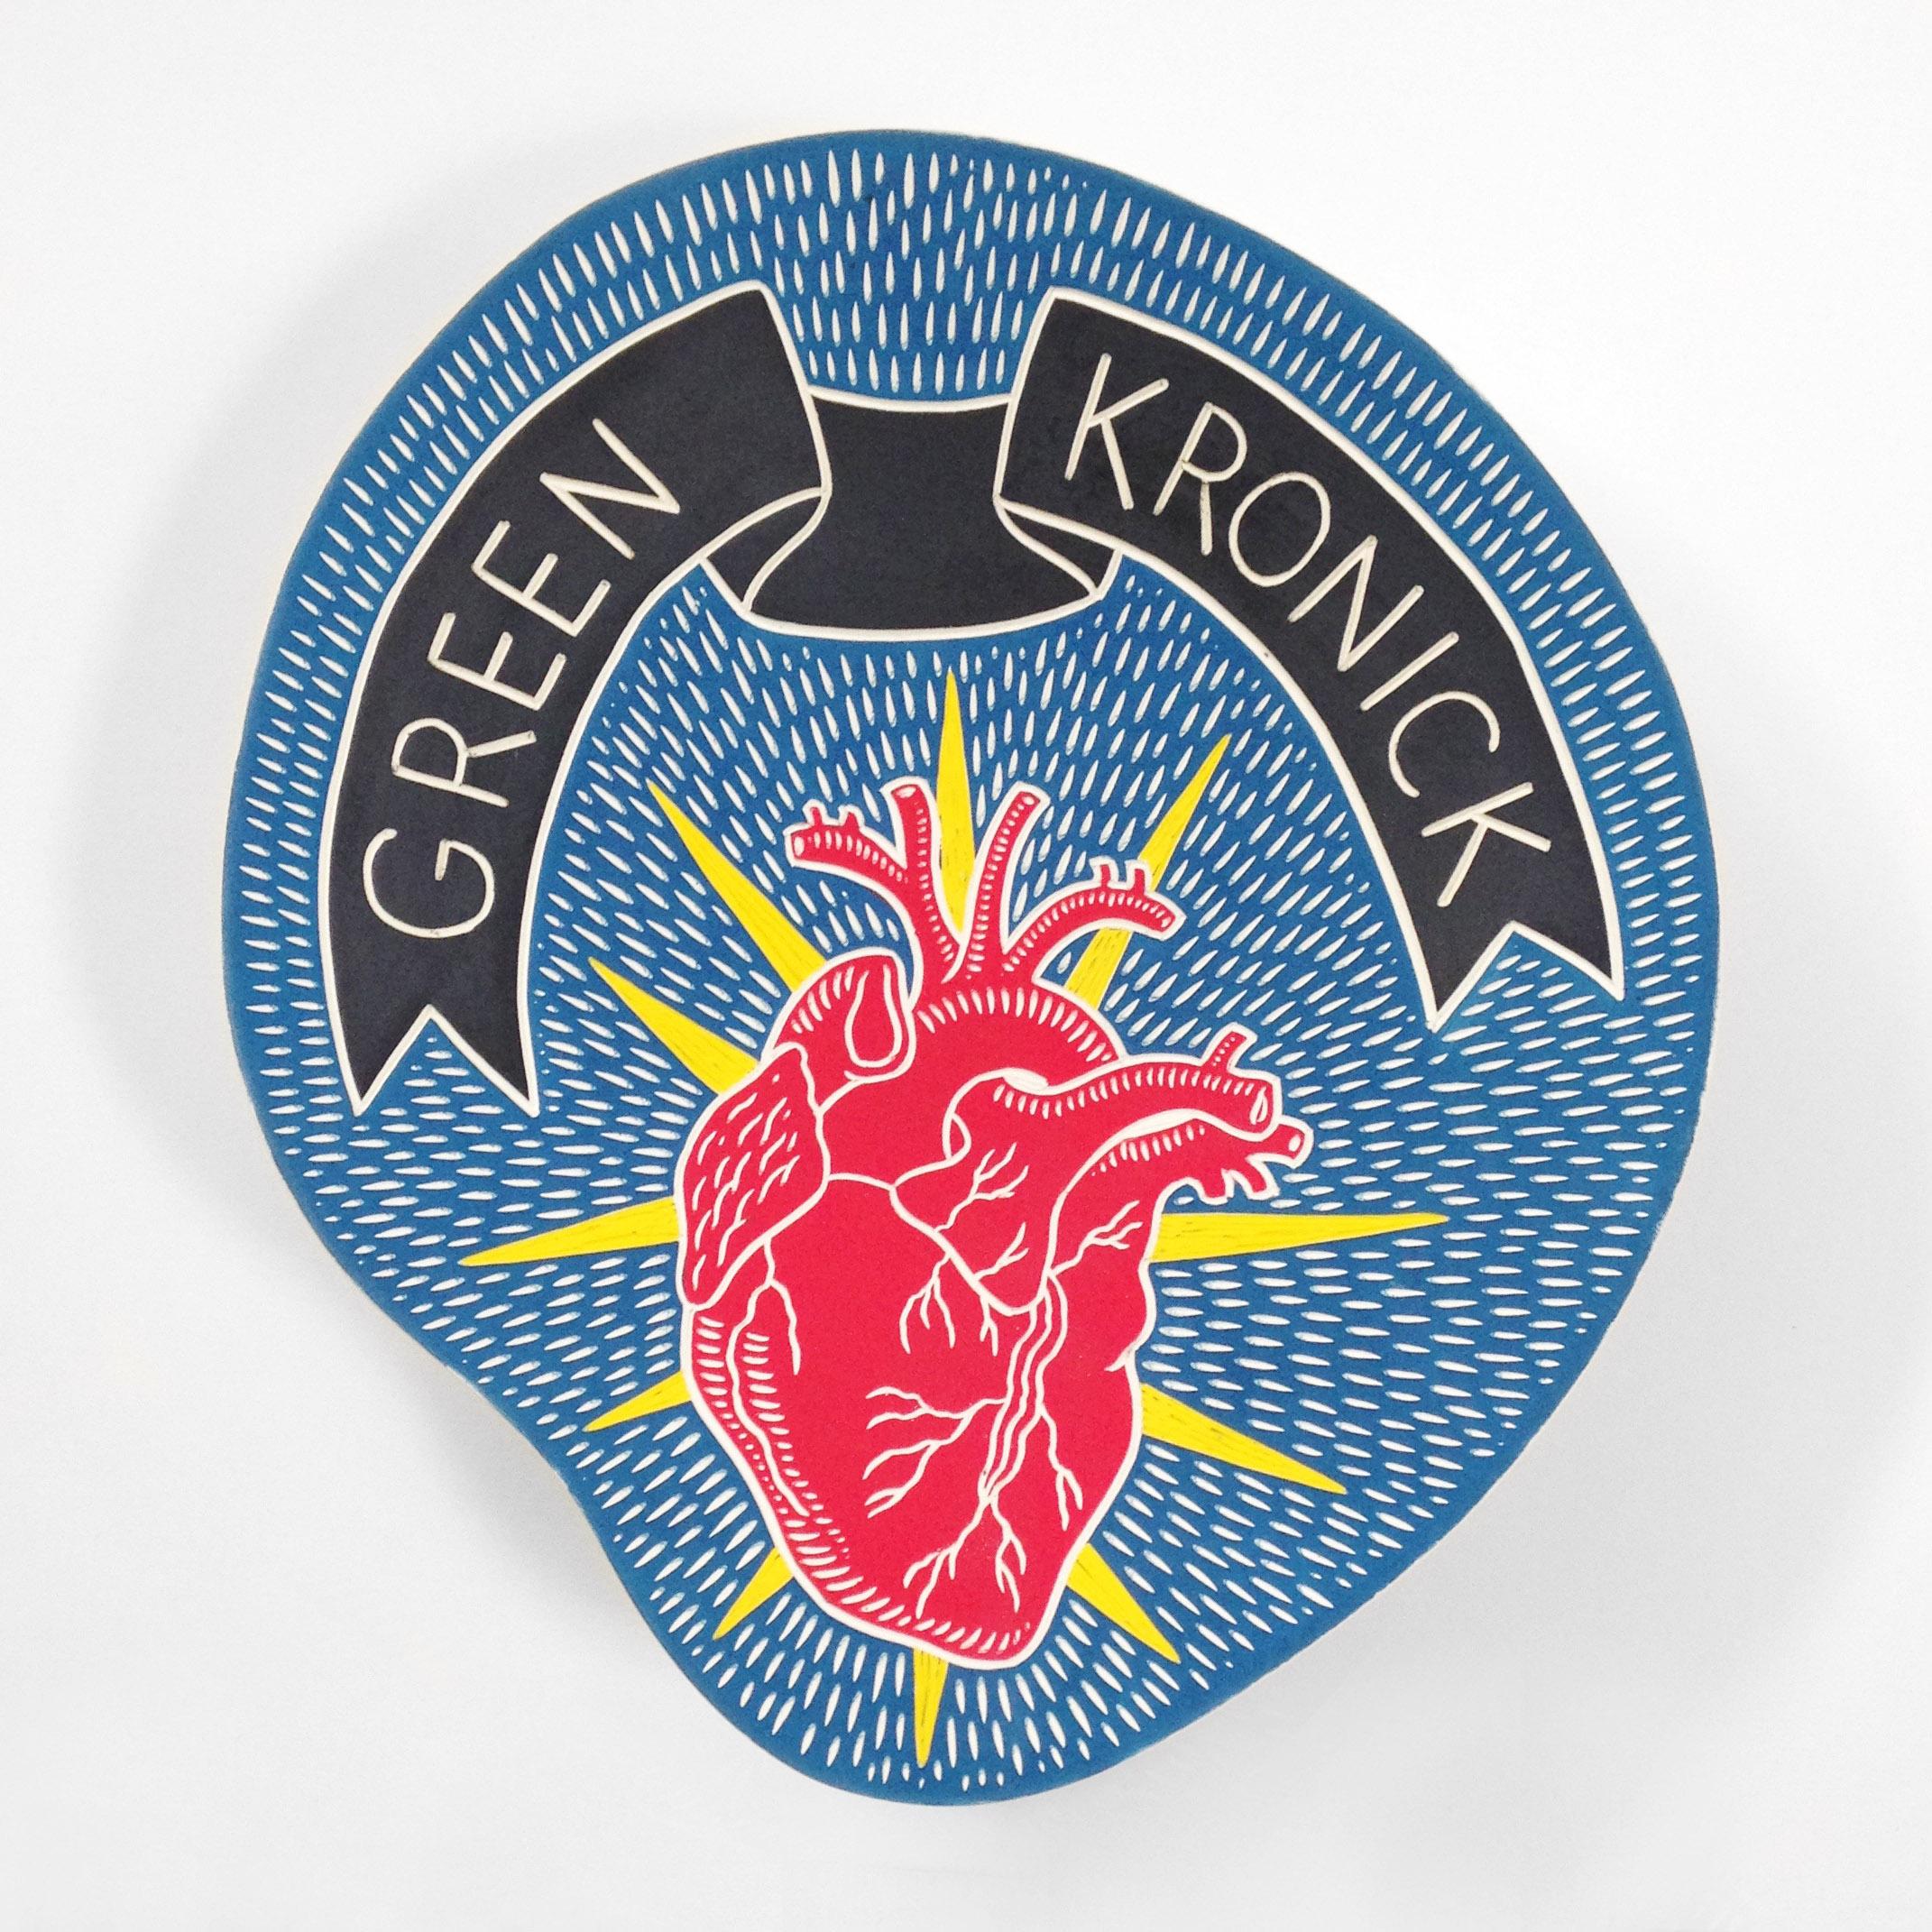 Green Kronick wedding platter, 2016